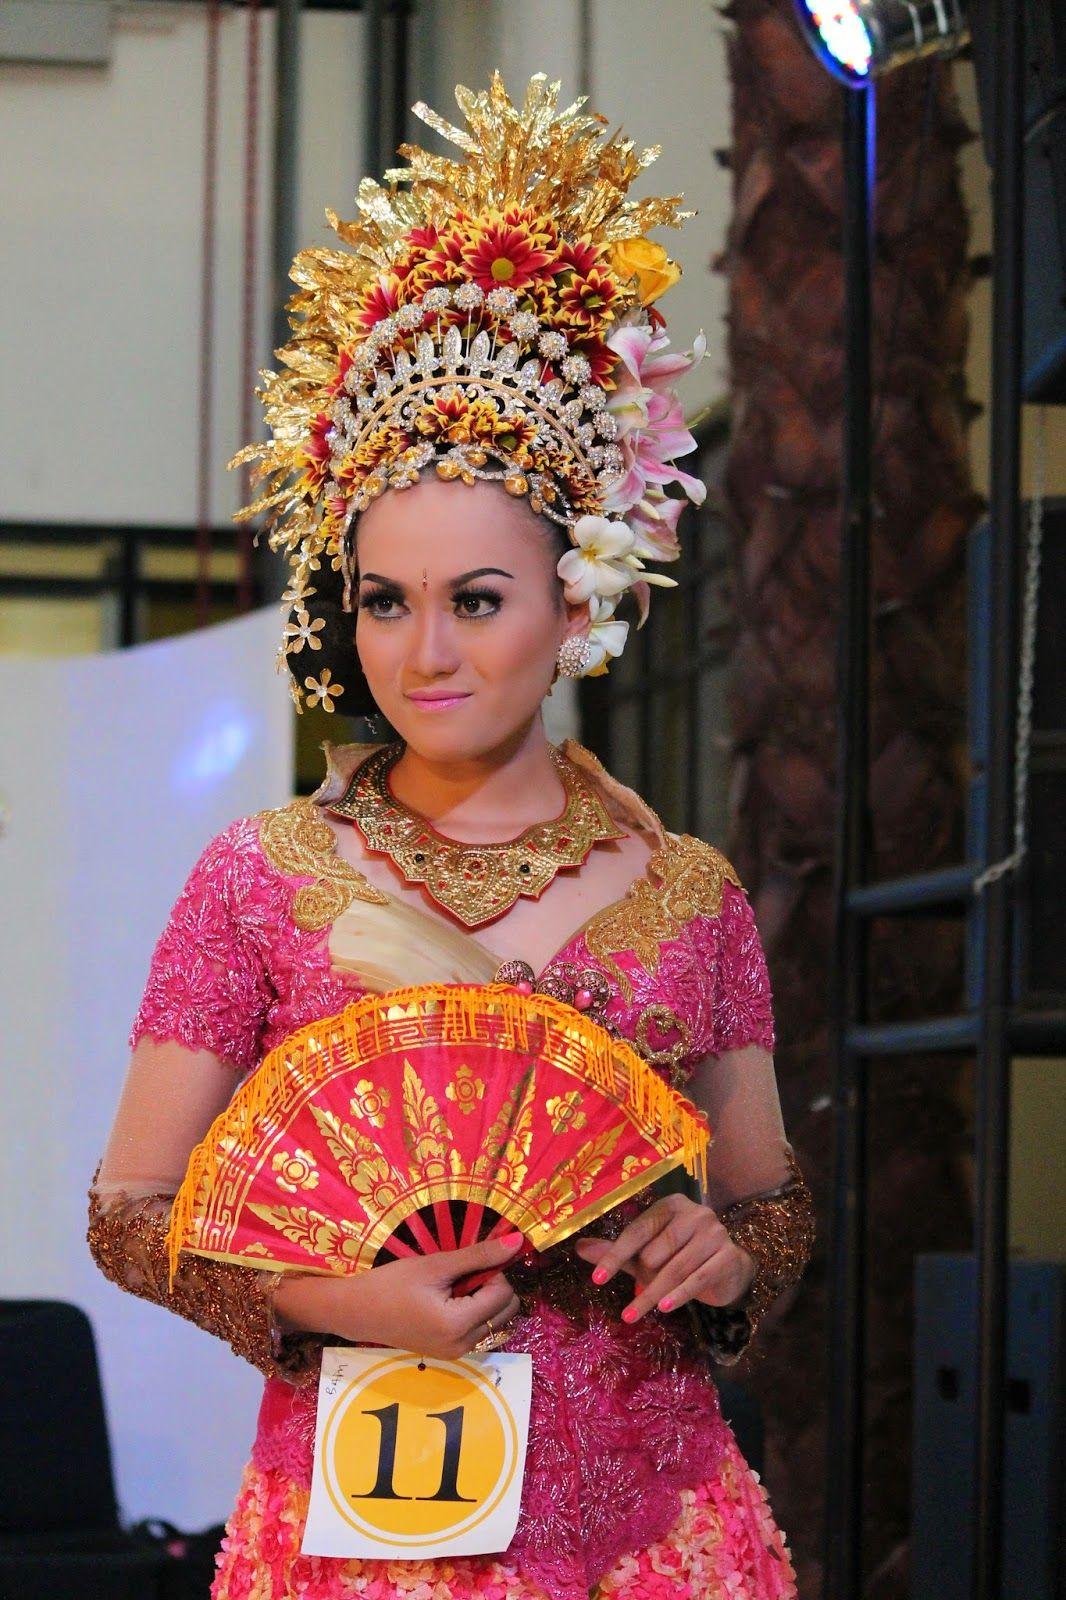 Pin Di Sewa Baju Adat Bali Baju Daerah Bali Bali Anak